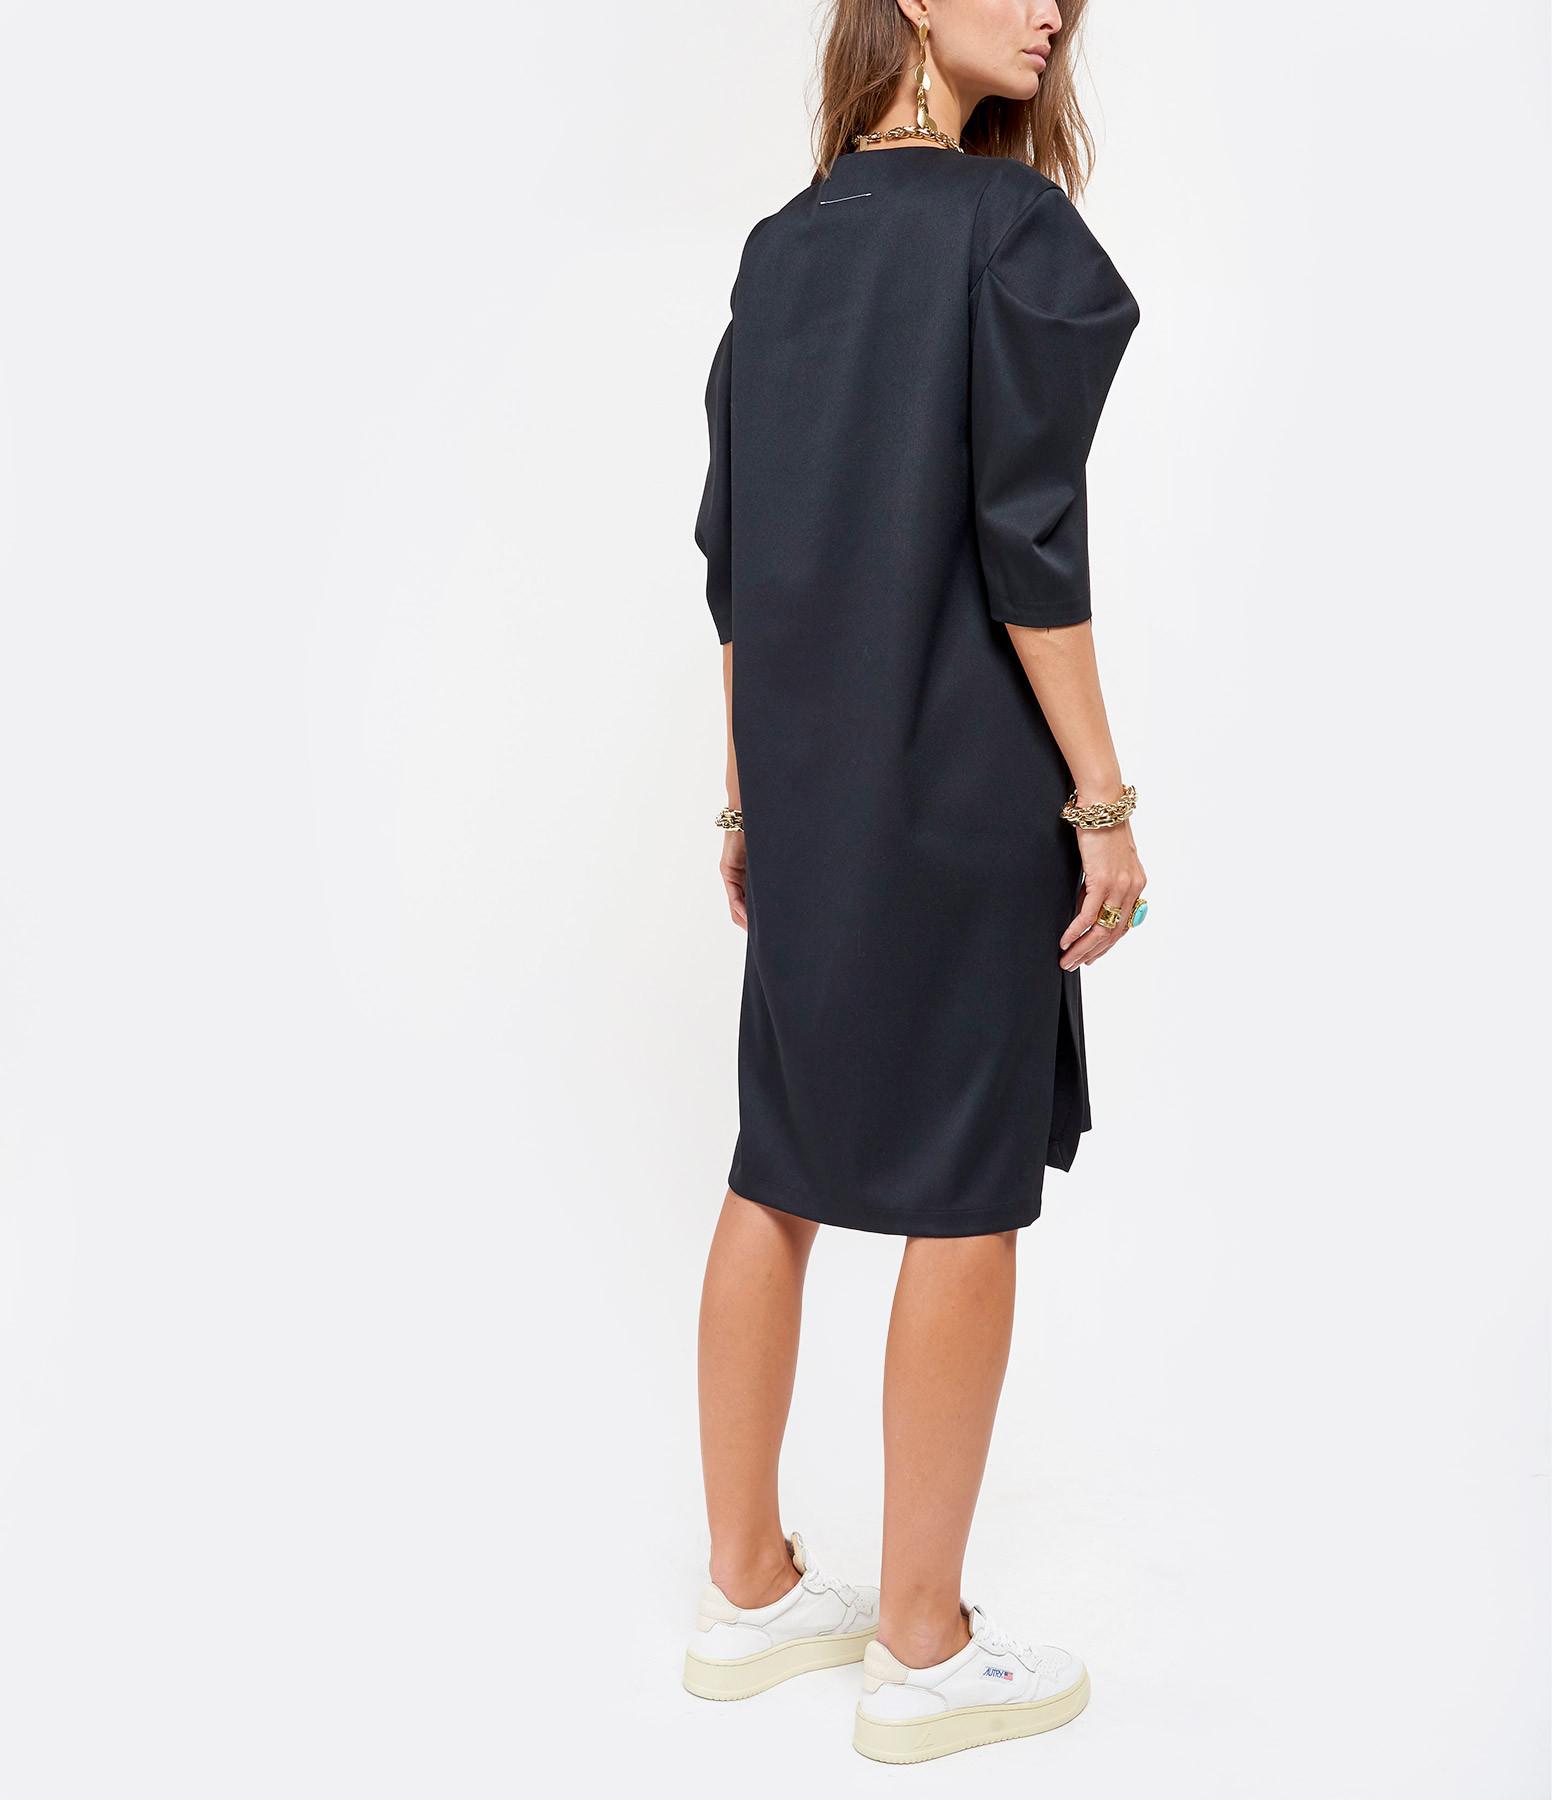 MM6 MAISON MARGIELA - Robe Laine Noir